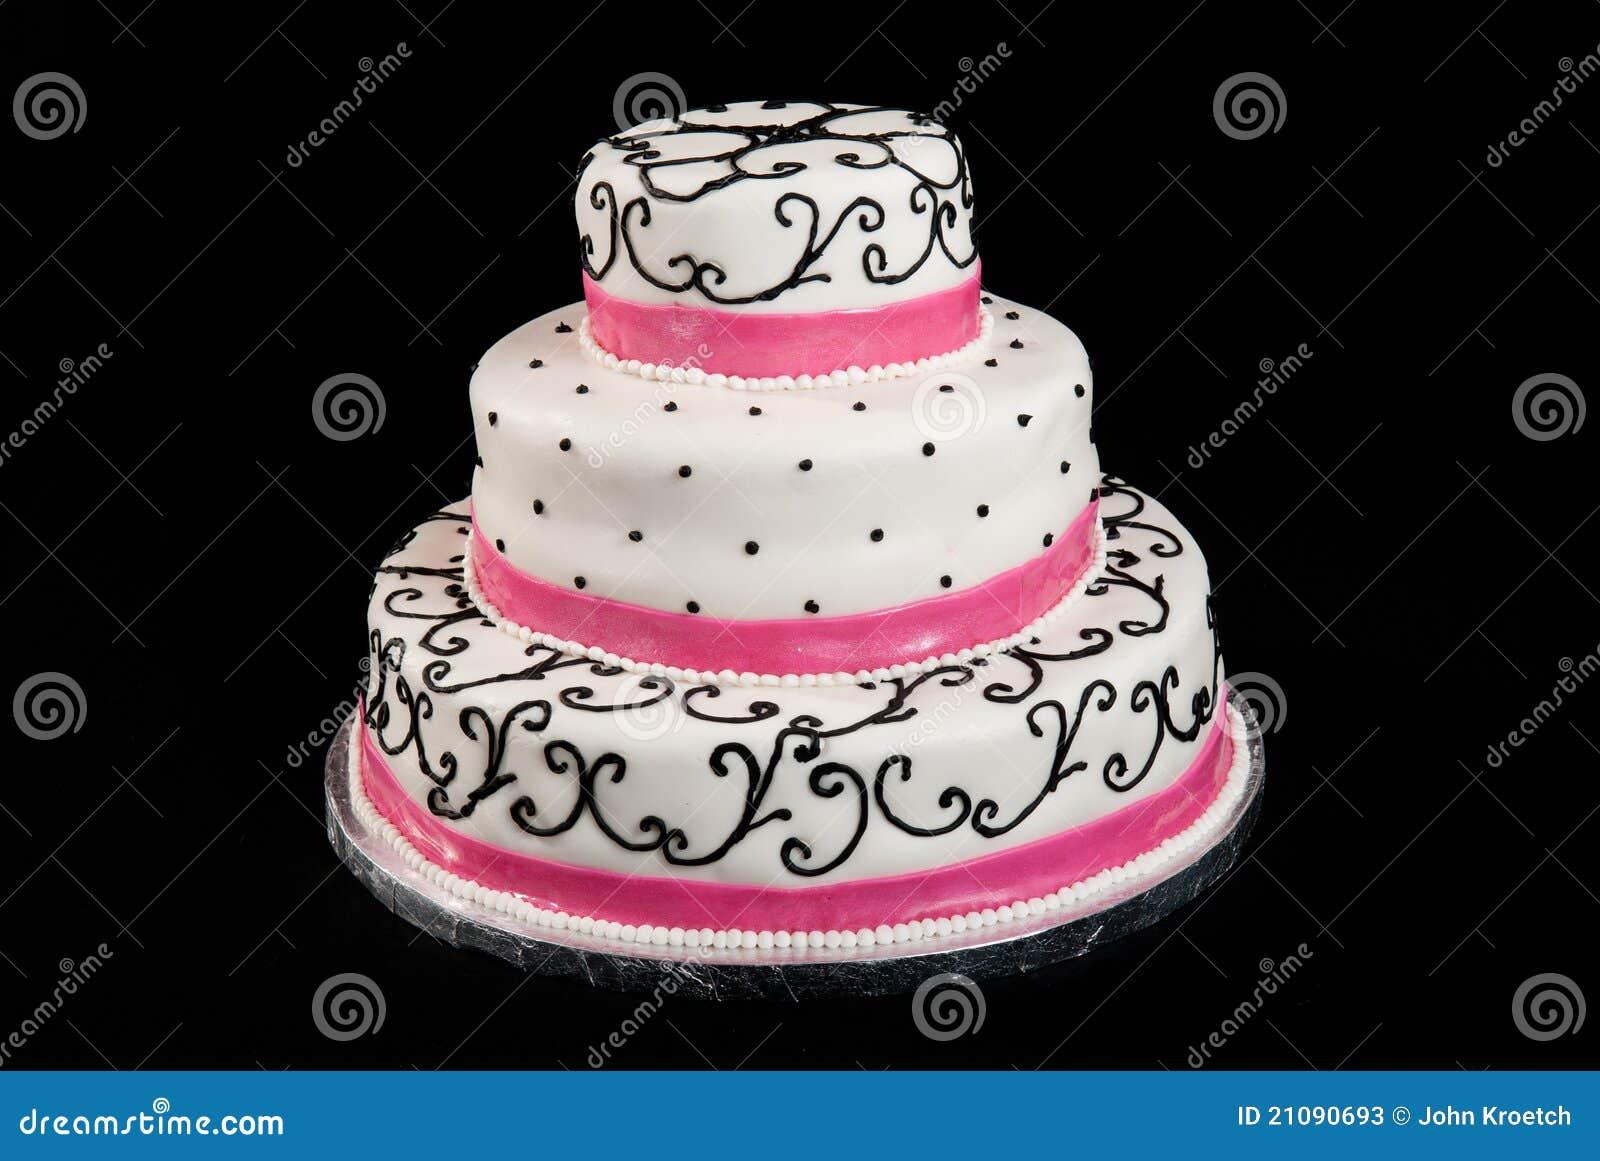 Three Tier Wedding Cake Stock s Image